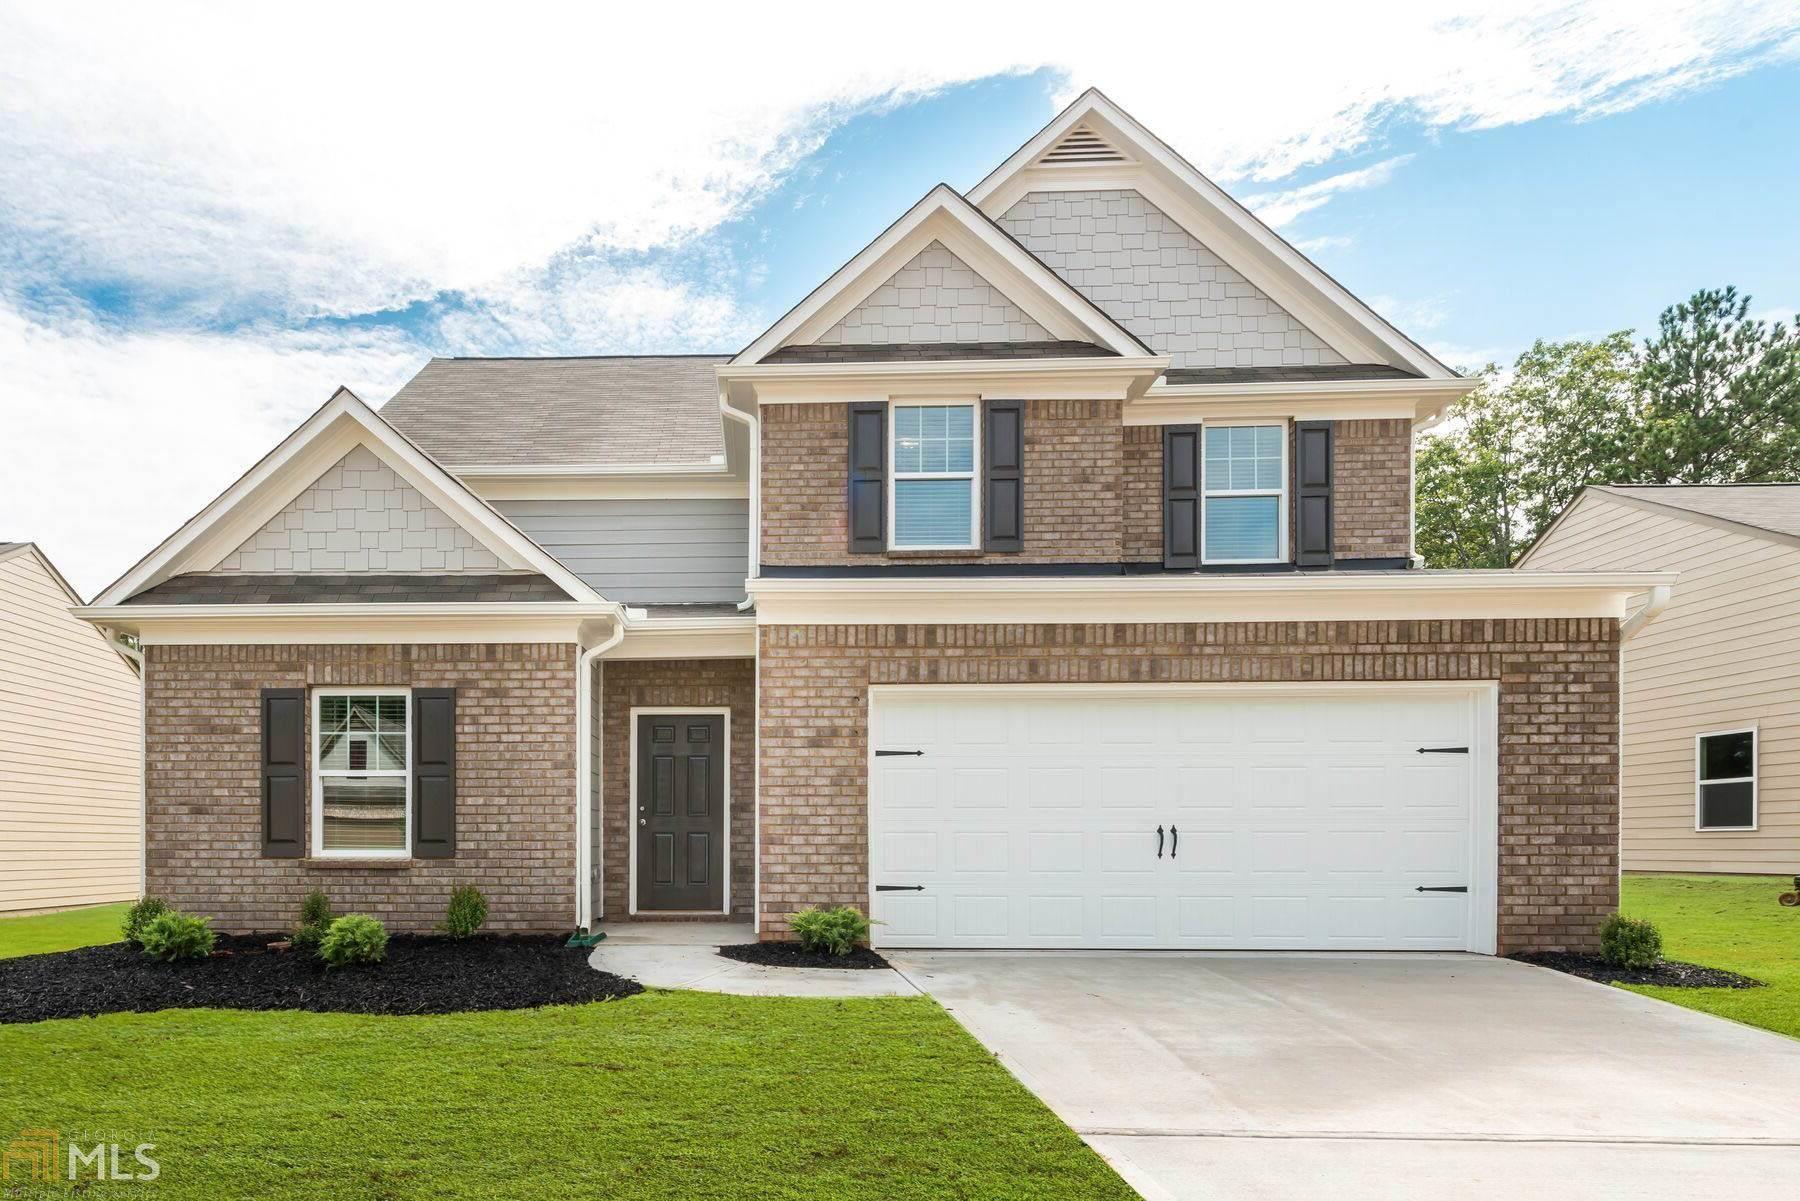 107 Cypress Pt, Cartersville, GA 30120 - MLS#: 8878523